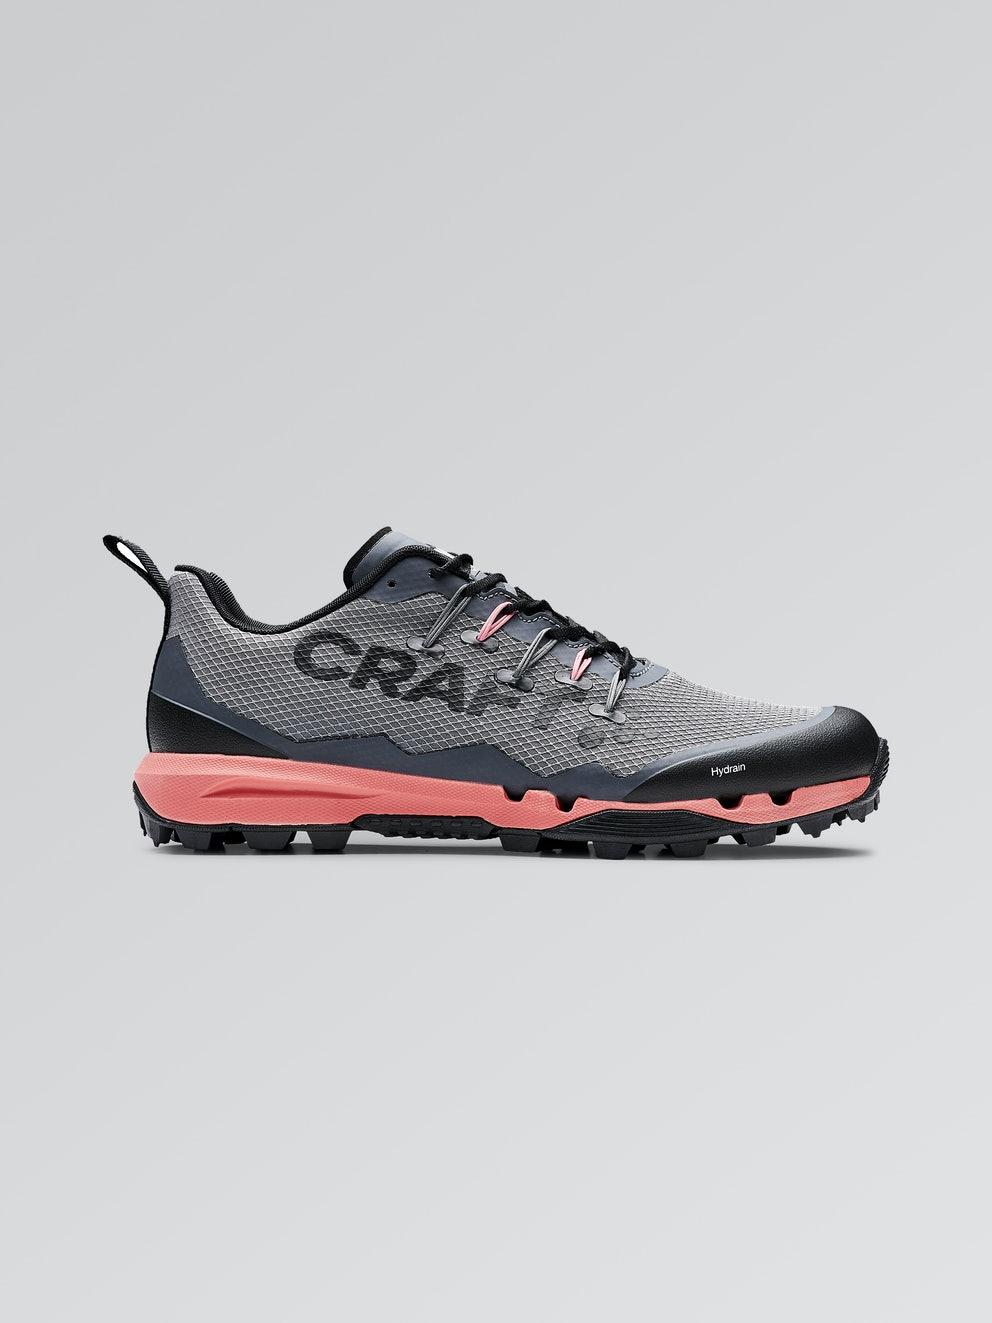 craft ocr ctm speed chaussure trail 6